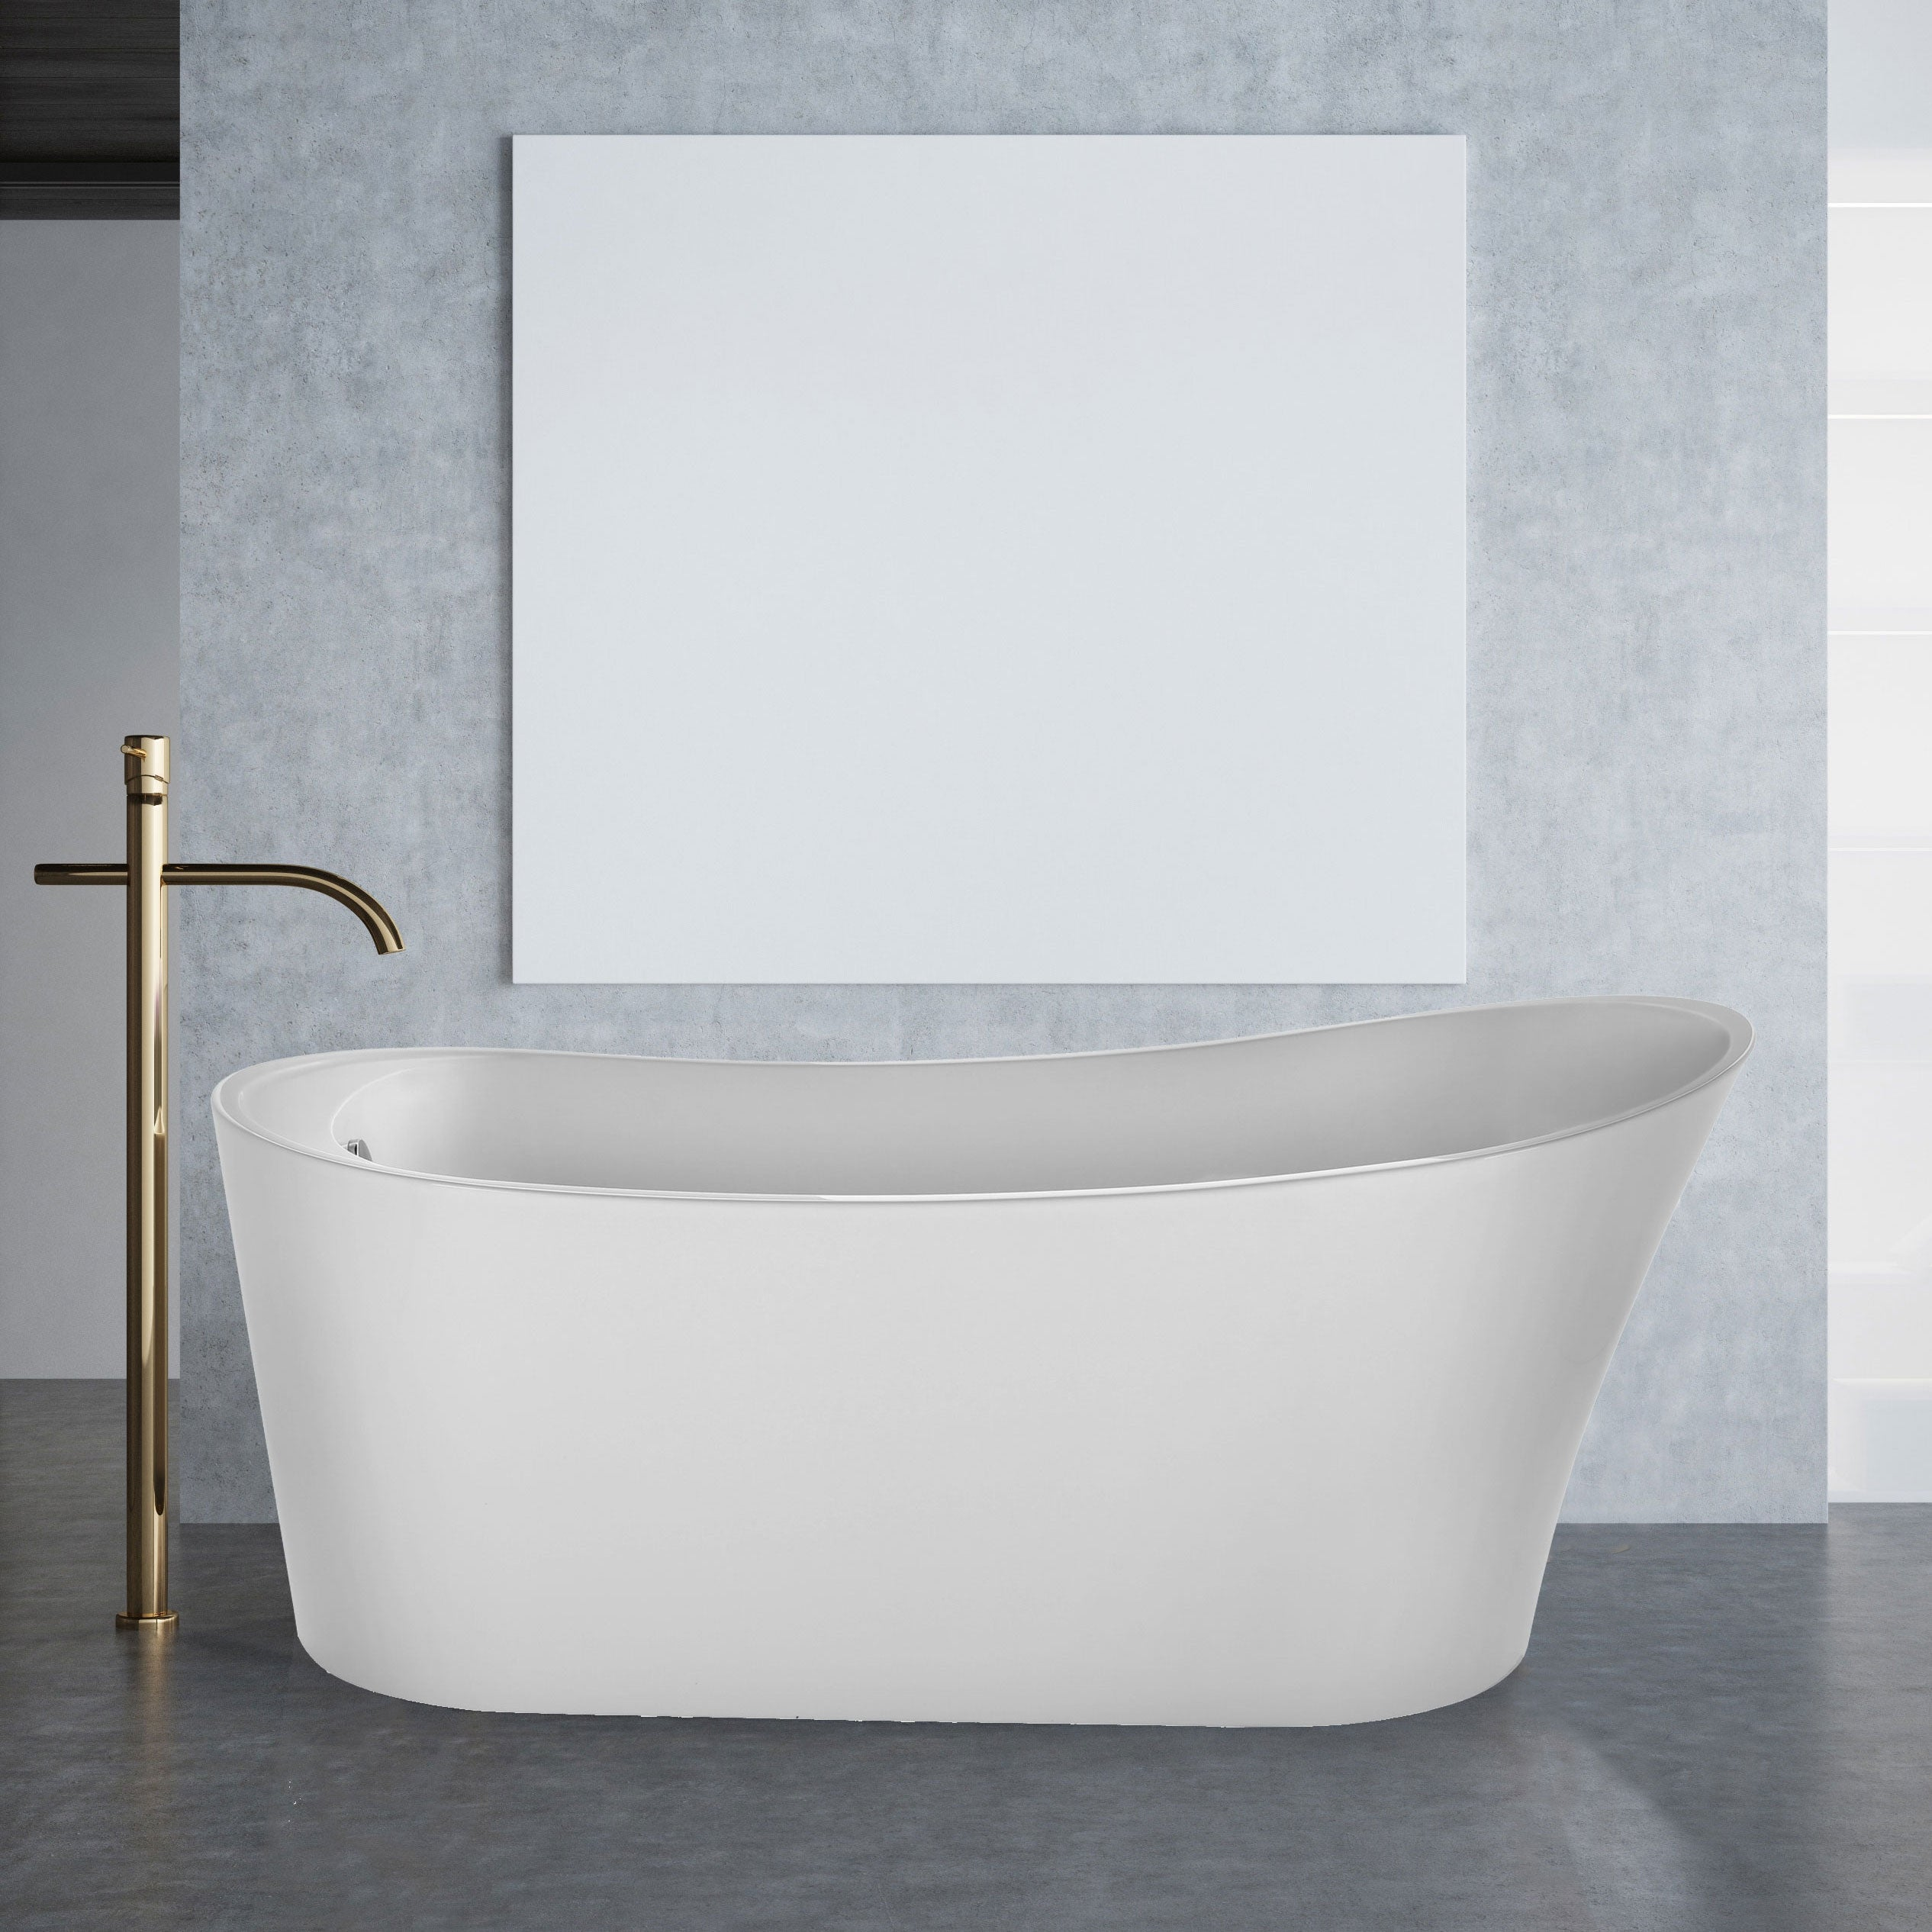 67 X 31 Freestanding Soaking Bathtub Overstock 31571233